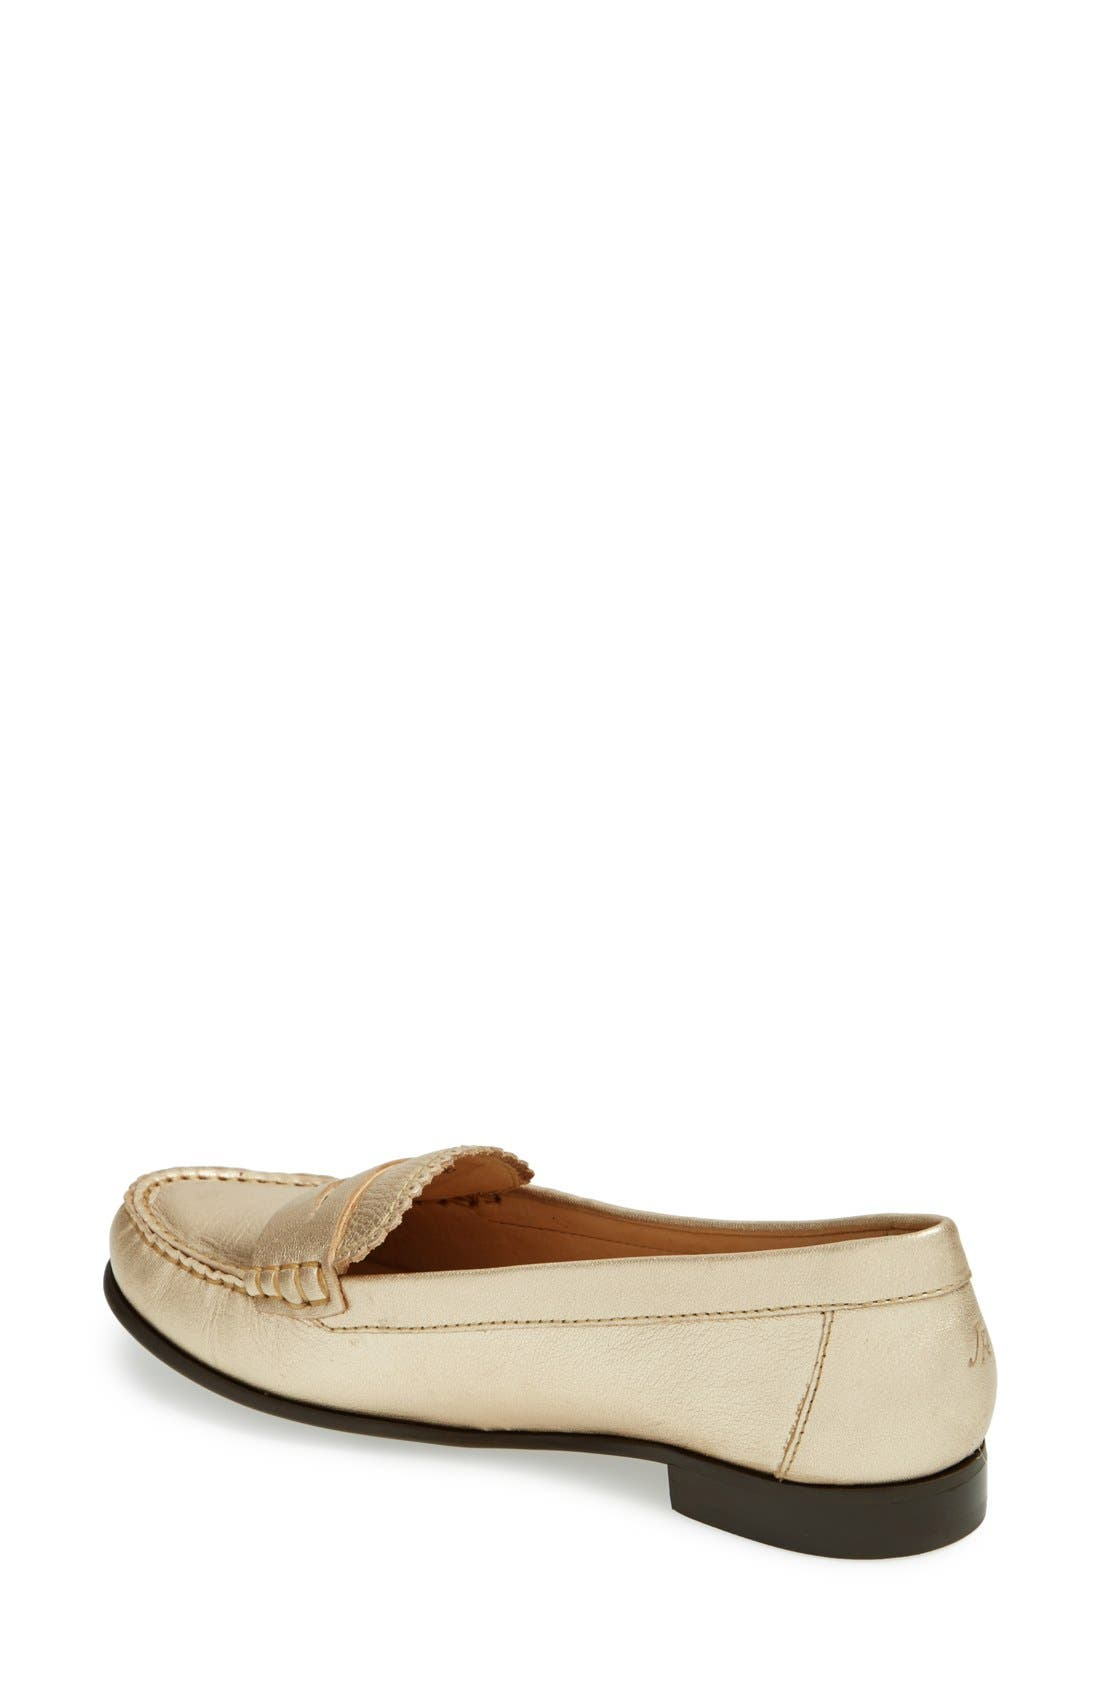 'Quinn' Leather Loafer,                             Alternate thumbnail 8, color,